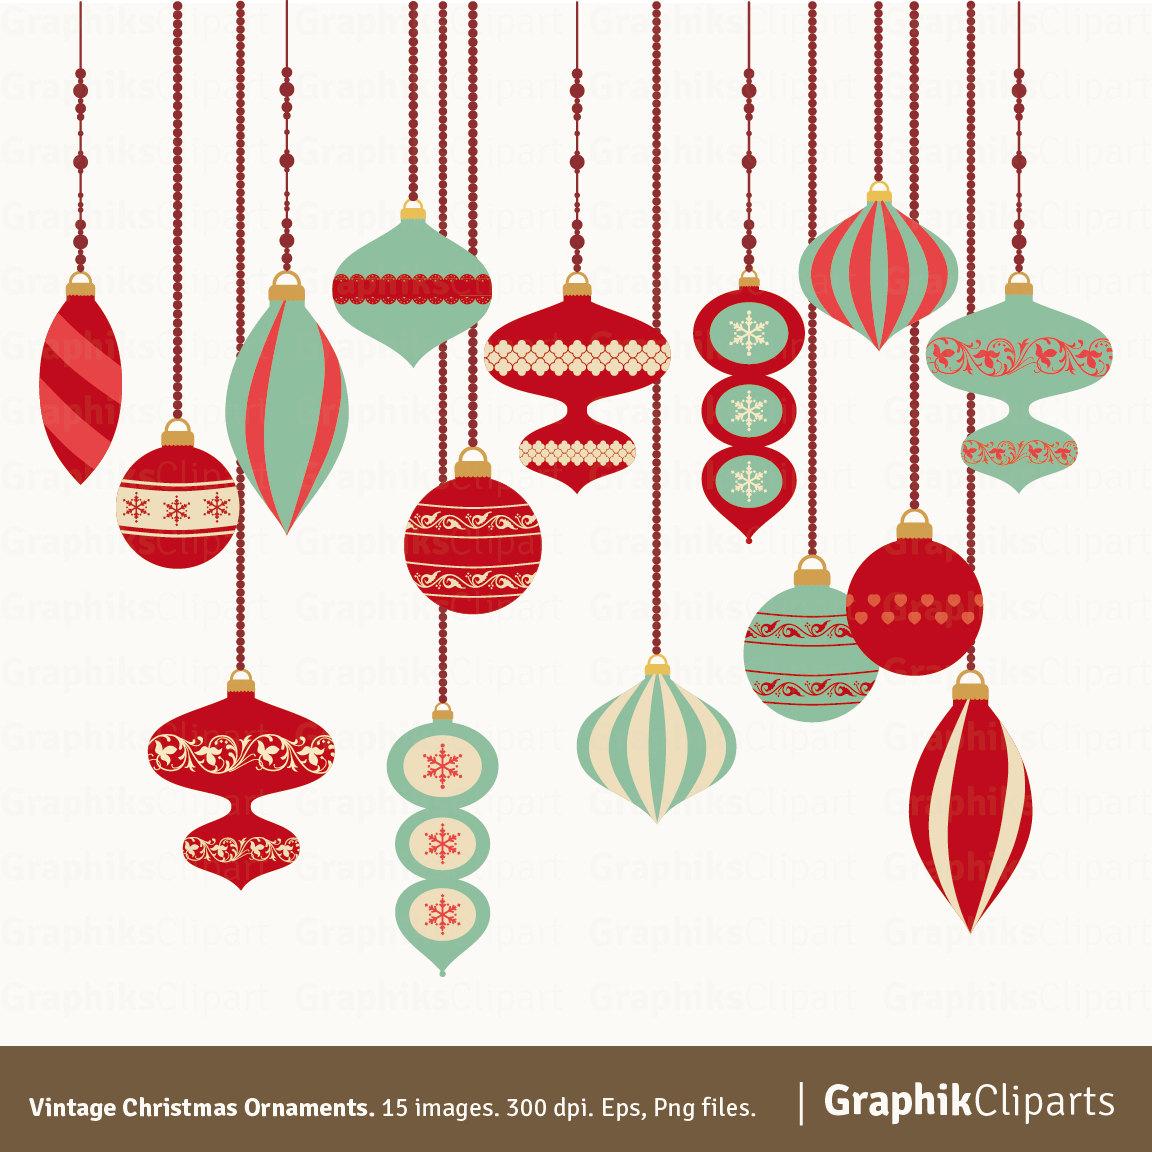 Free Ornament Cliparts, Download Free Clip Art, Free Clip.